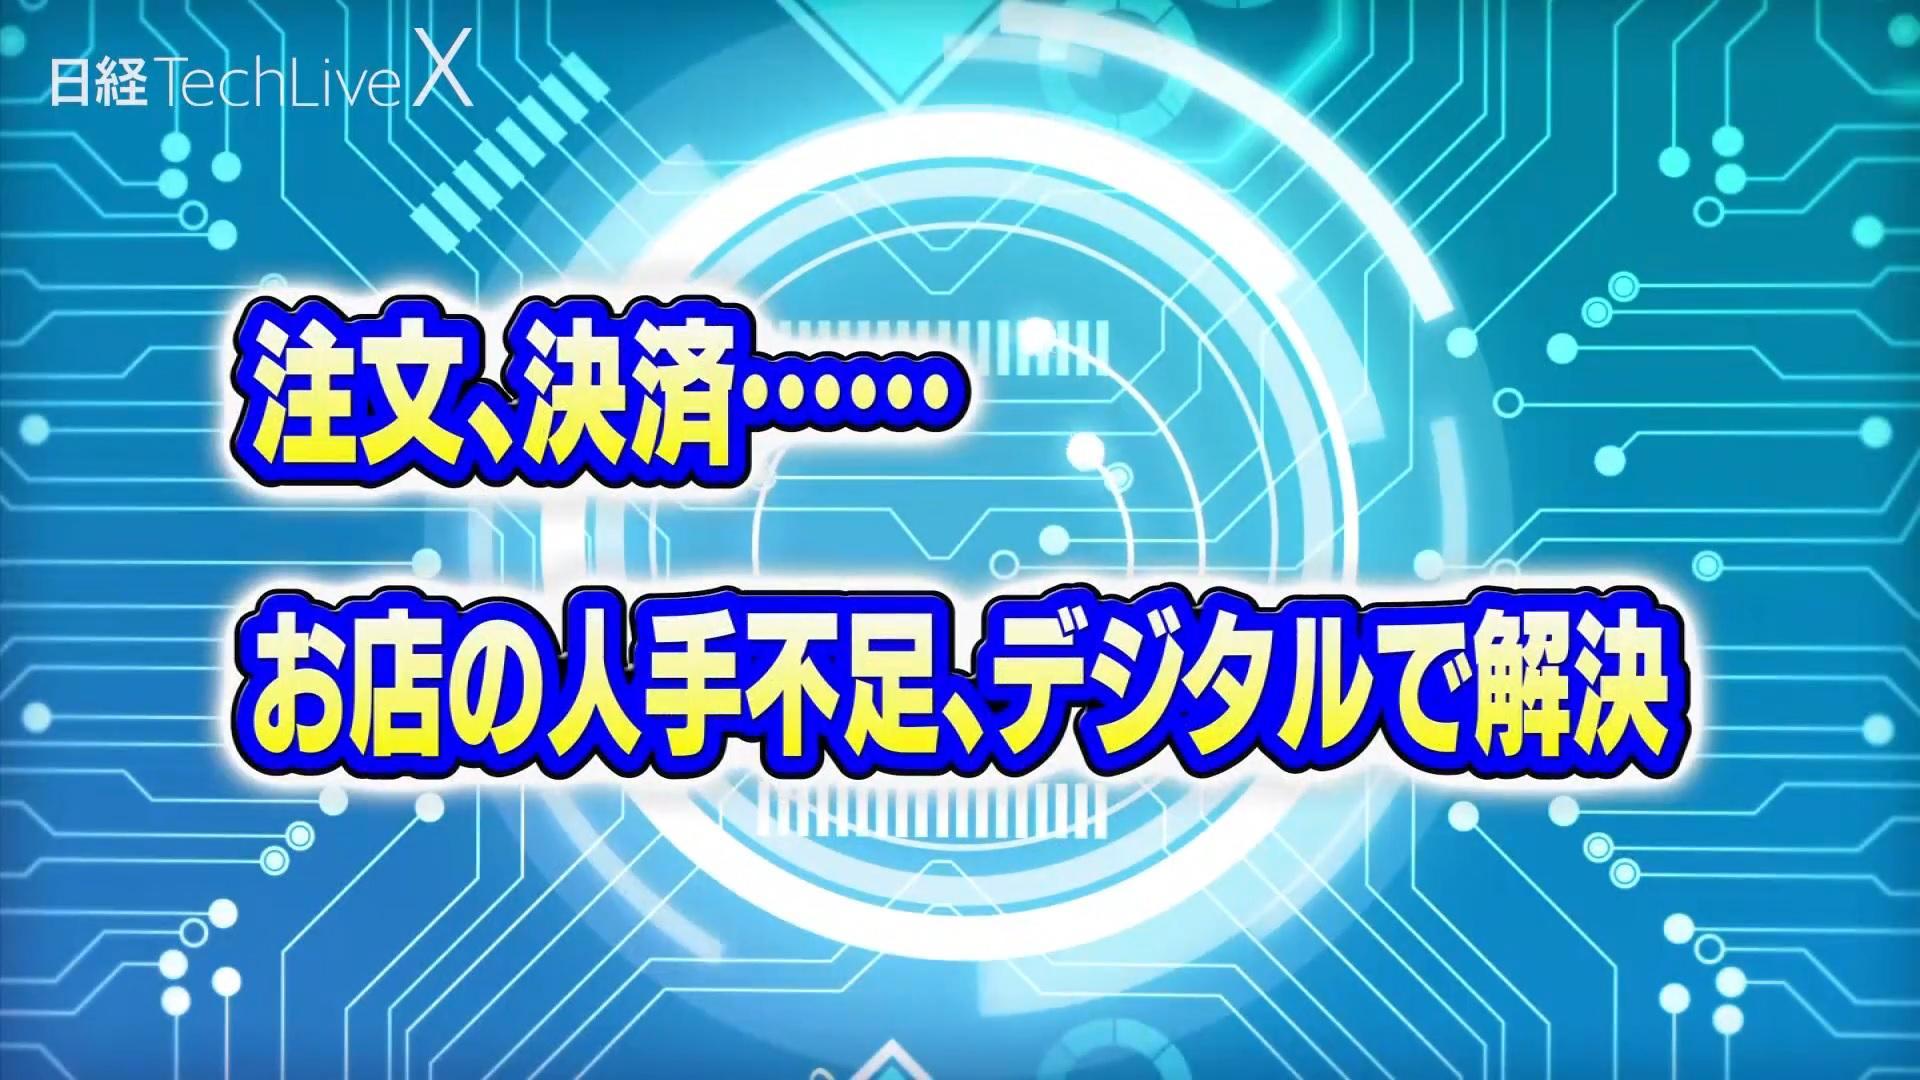 20180808_nikkeitlx05_02.jpg